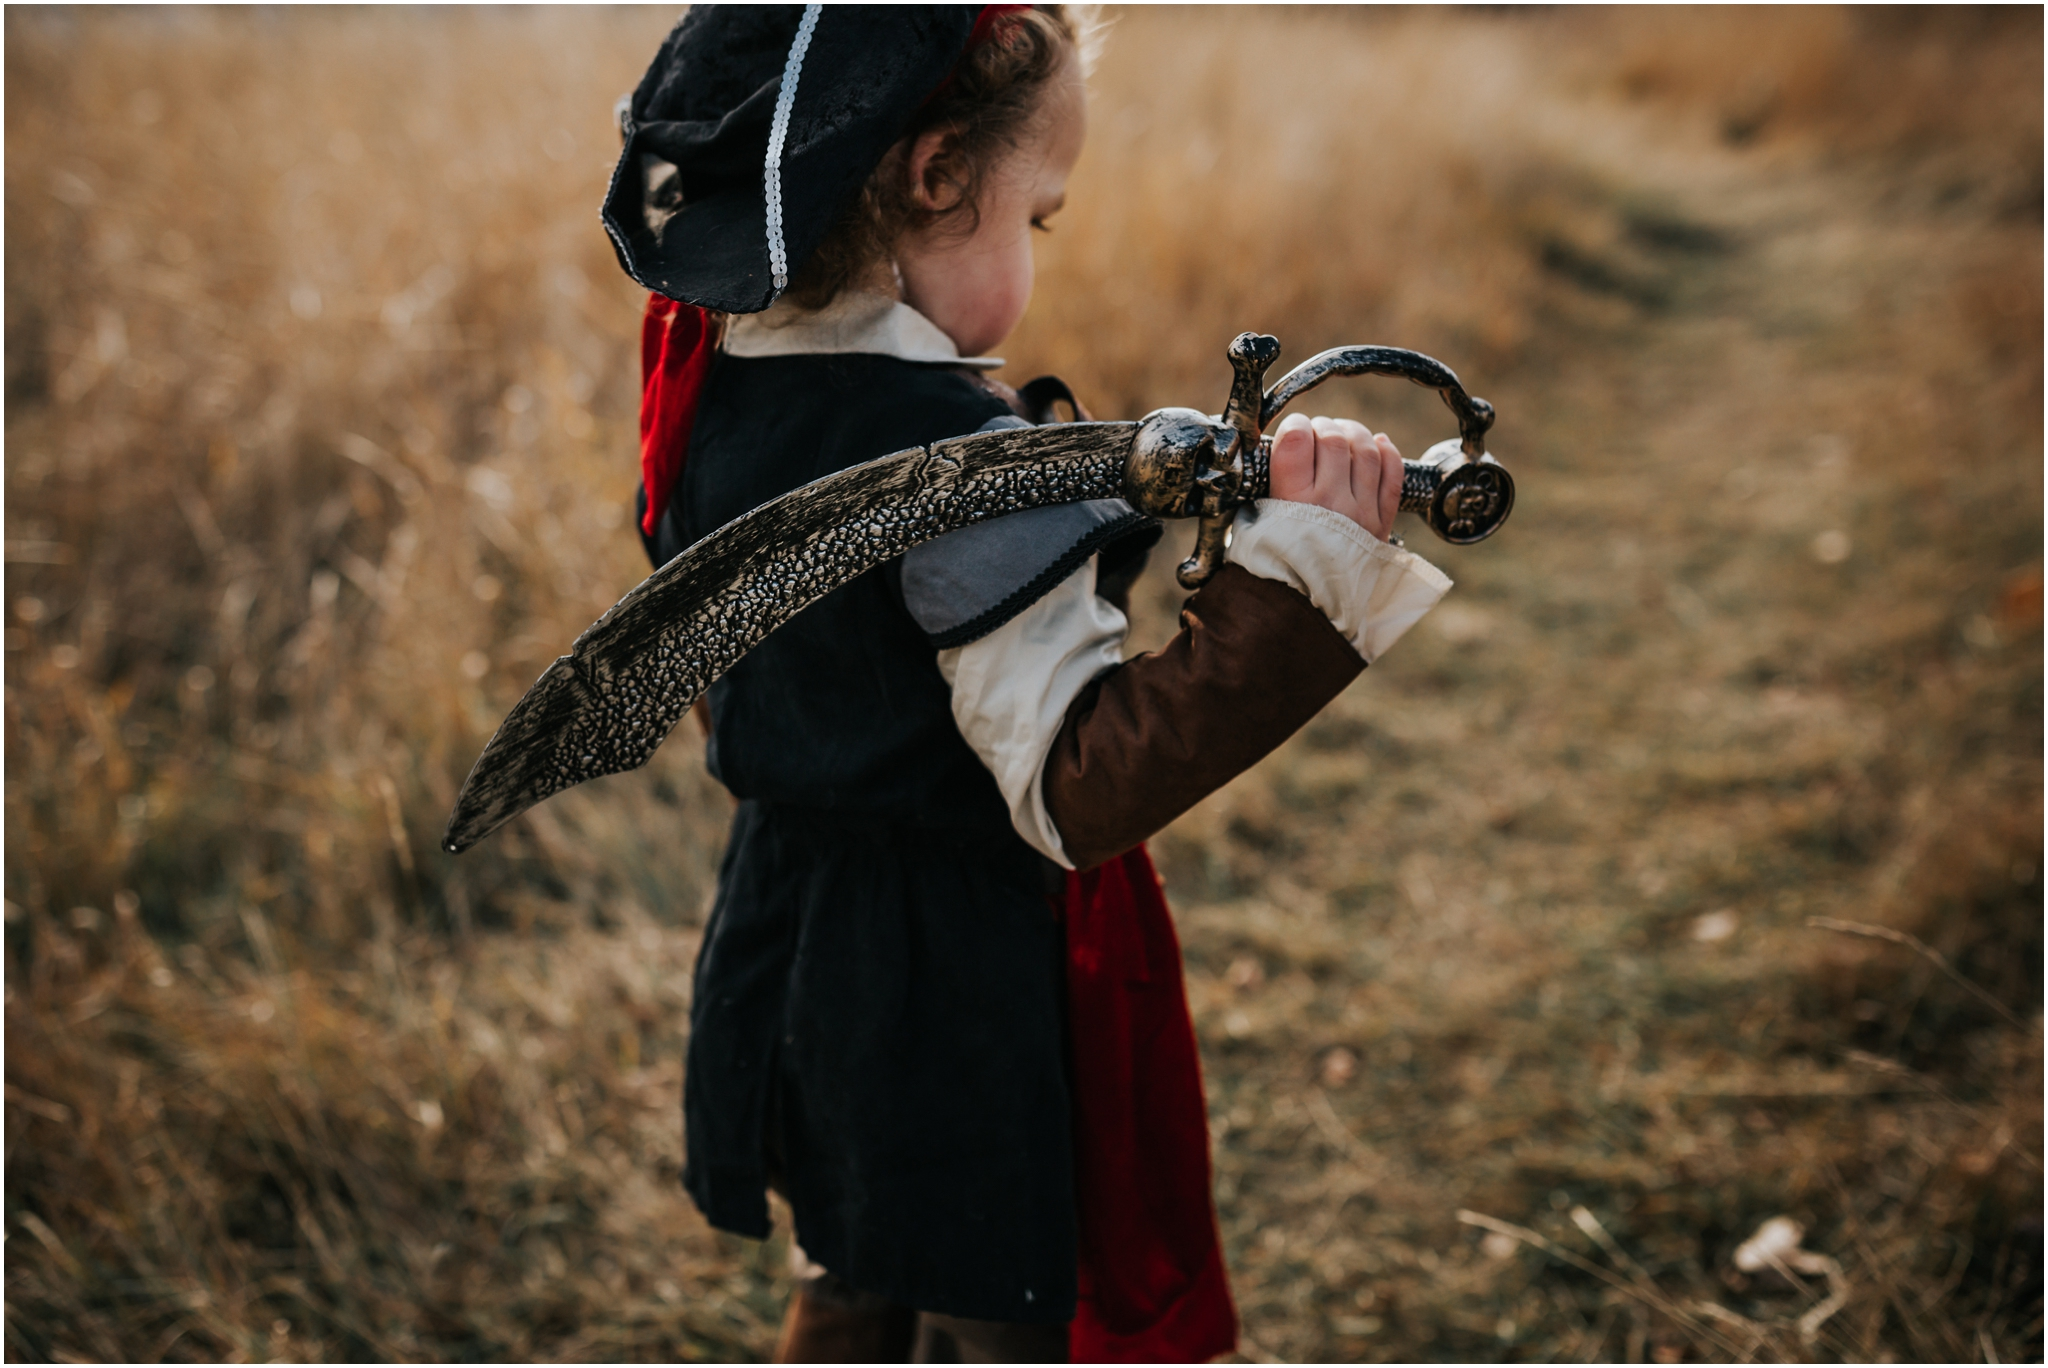 Edmonton Alberta Photographer - Family Photography - Lifestyle Photography - Documentary Photographer - Pirate Costume